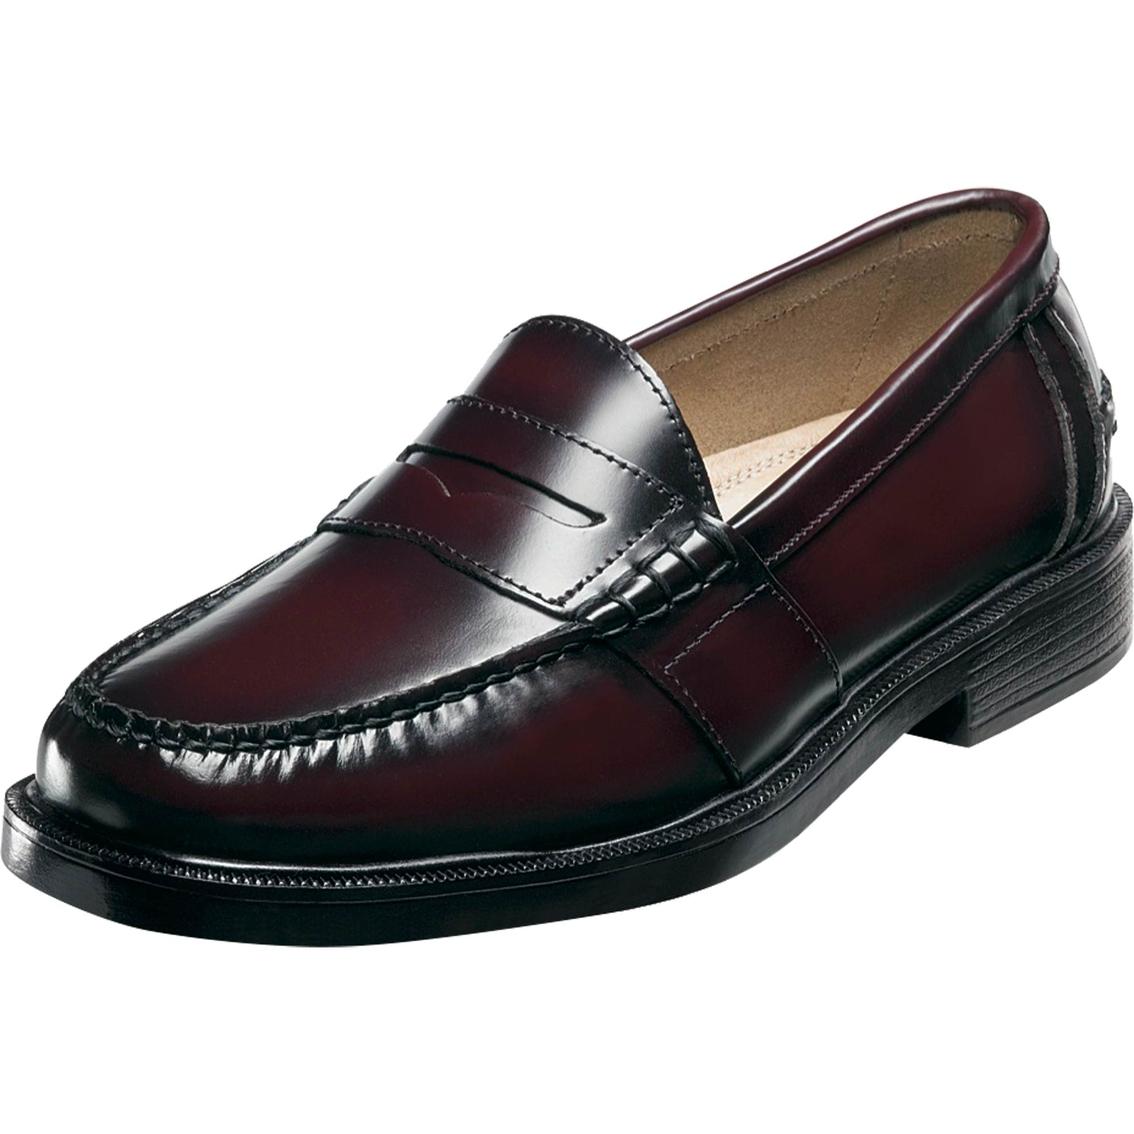 62293de9c358a9 Nunn Bush Men s Lincoln Shoes